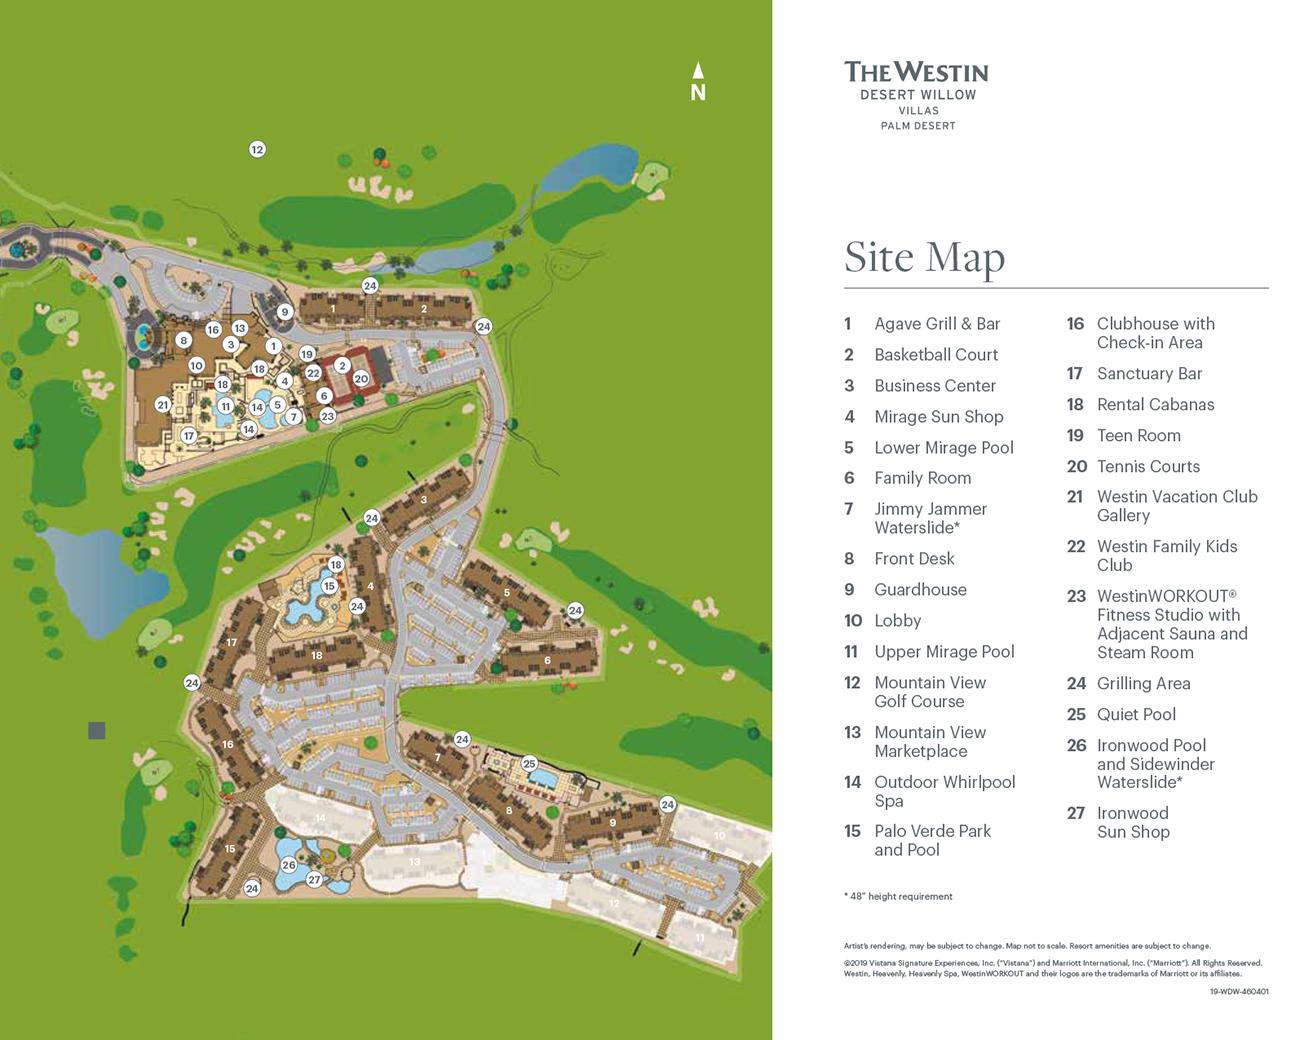 The Westin Desert Willow Villas Palm Desert Maps